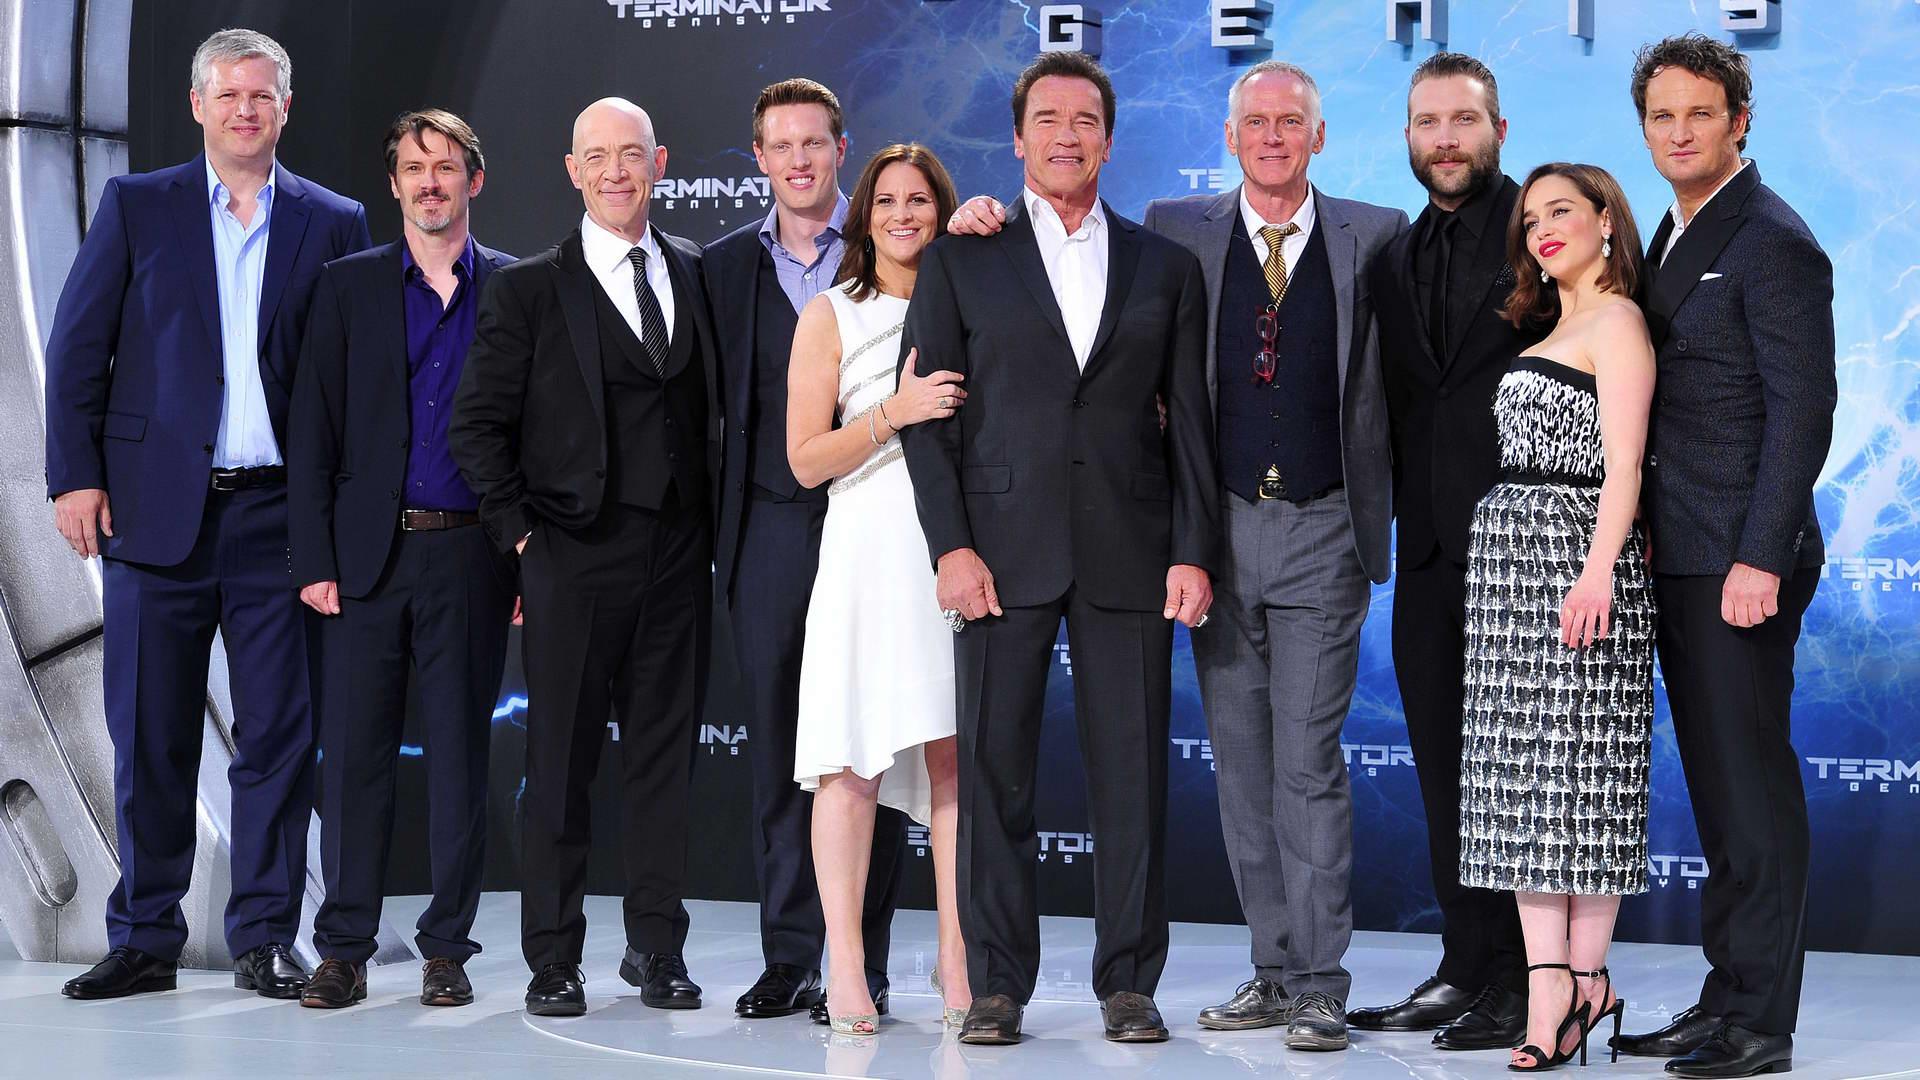 Cast Cast  -  Premiere TERMINATOR - GENISYS im Cinestar im Sonycenter  in Berlin  am 21.06.2015 -  Foto: SuccoMedia / Ralf Succo